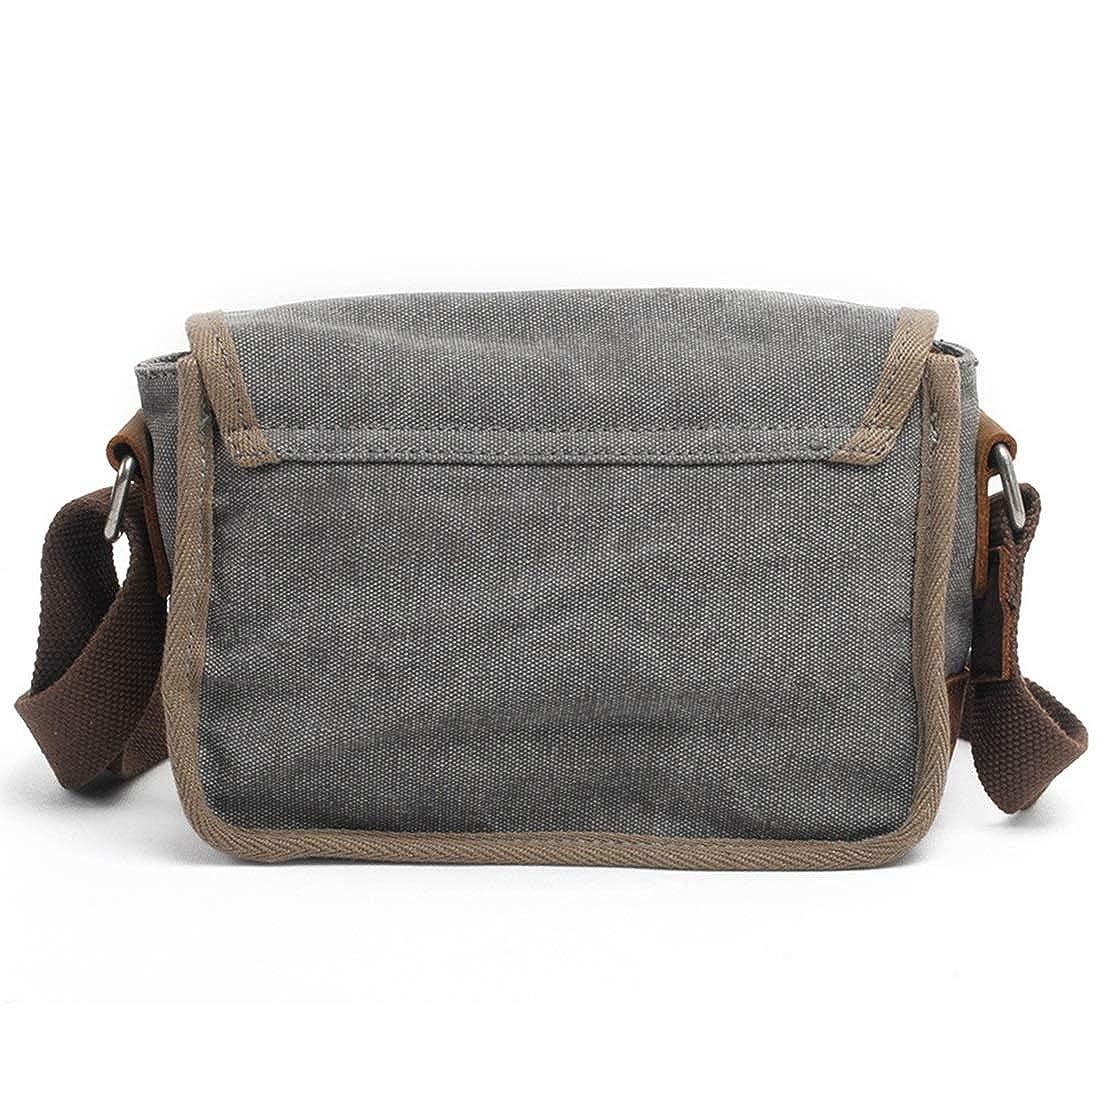 AIYAMAYA Mens Bag Messenger Bag Canvas Shoulder Bags Travel Bag Man Purse Crossbody Bags for Work Business